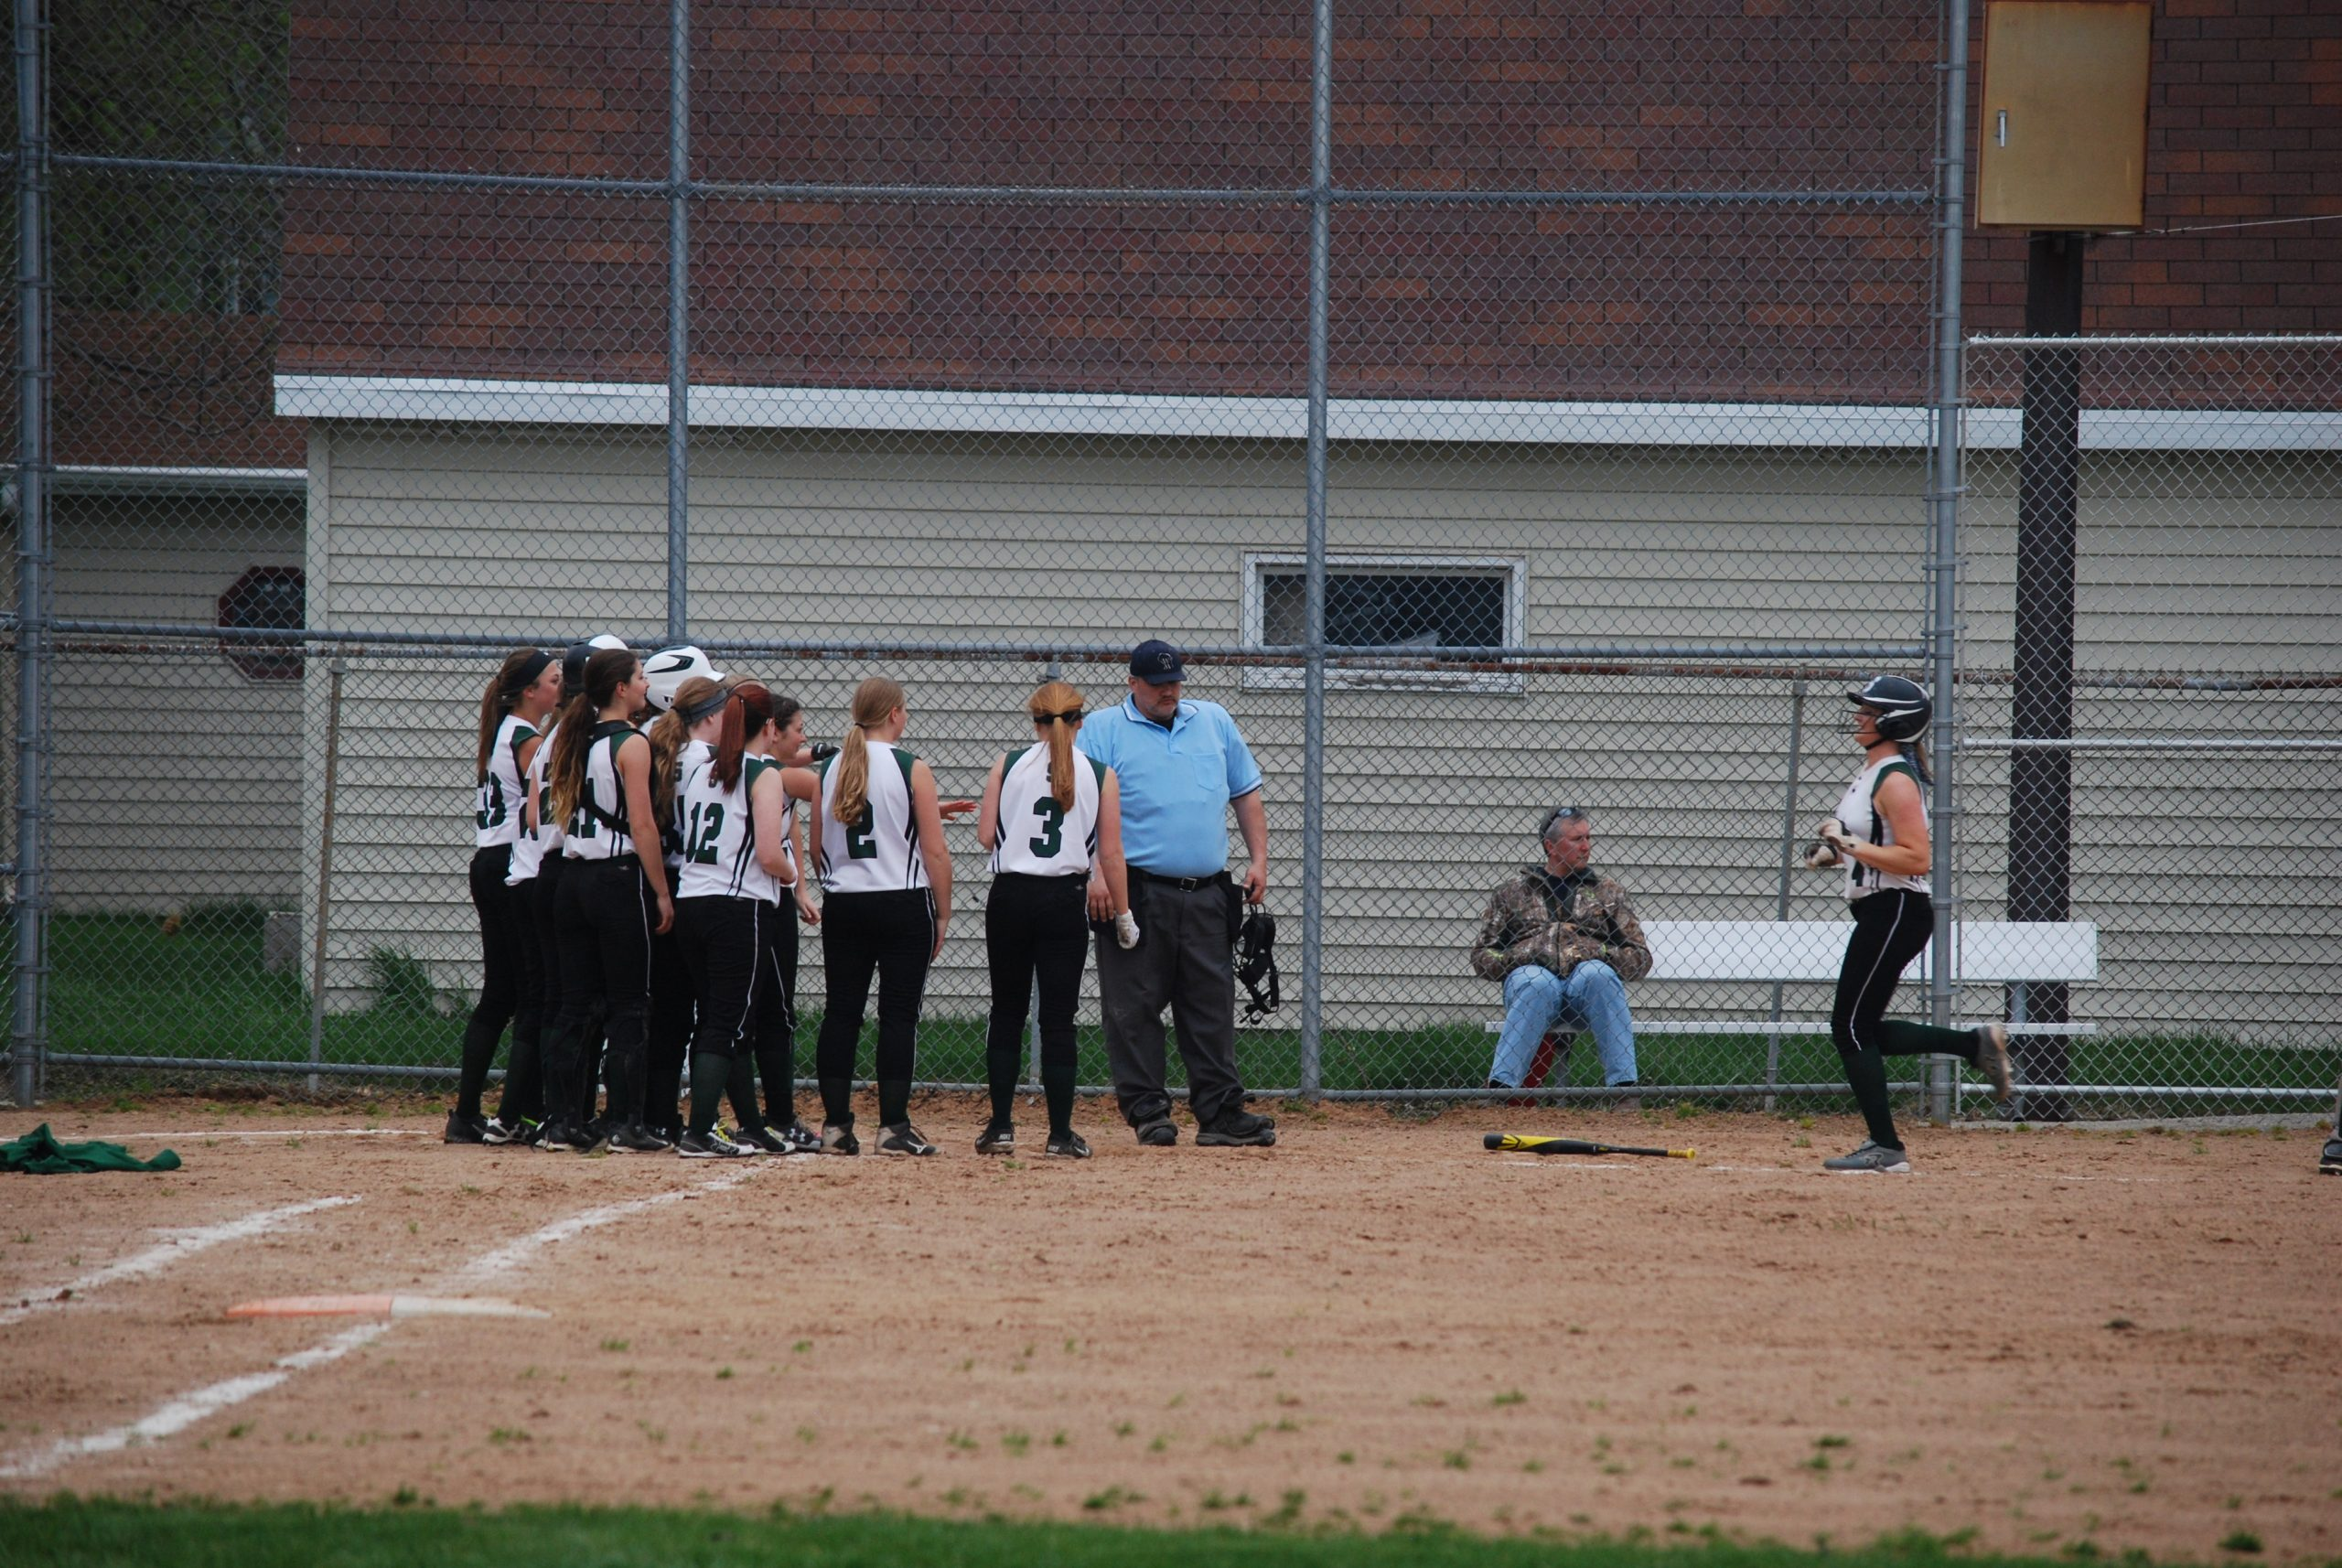 High School Softball: Tina Ubl's extra-inning, walk-off blast sends Shiocton past Weyauwega-Fremont